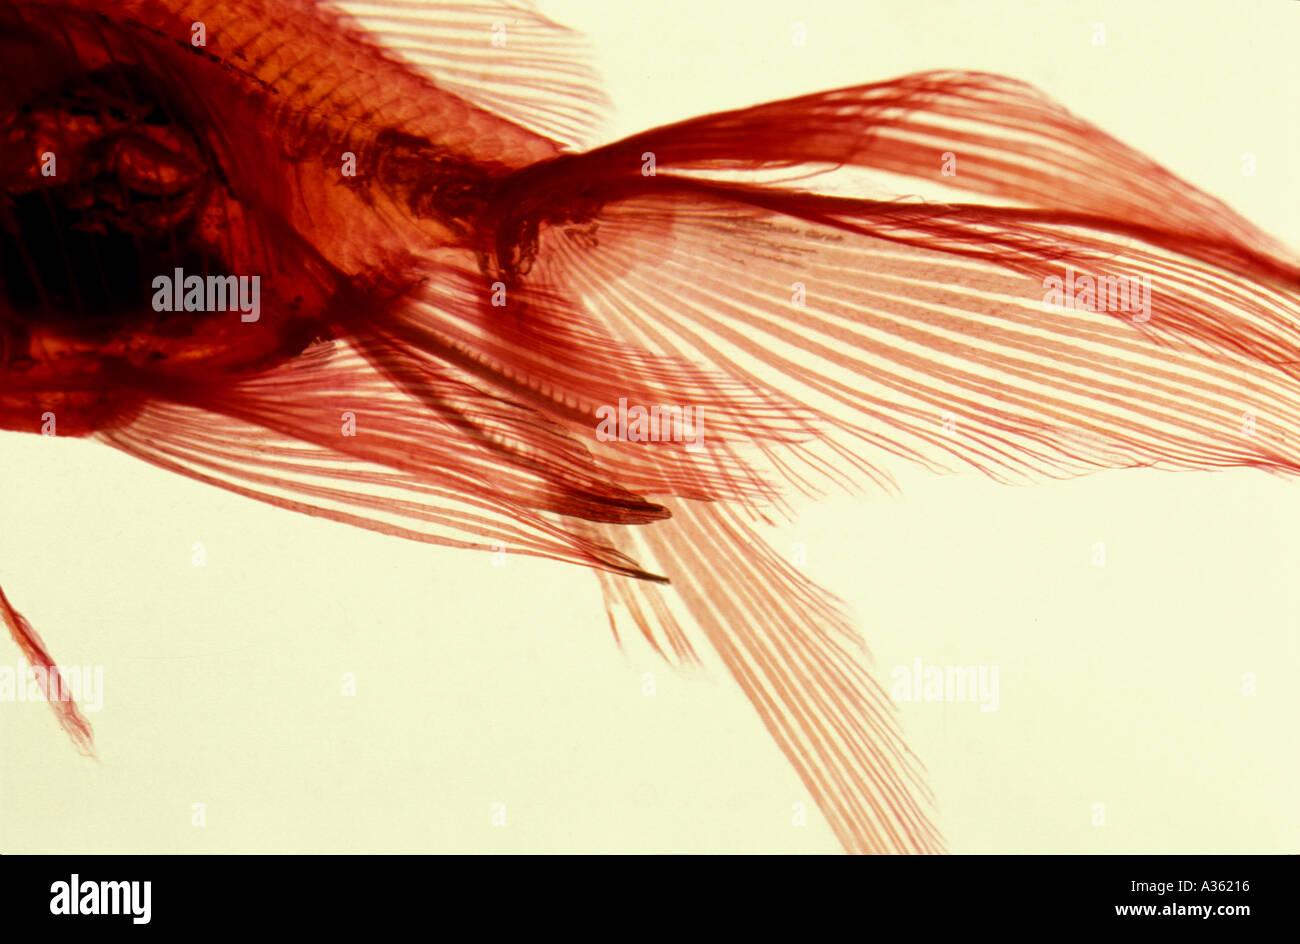 X Ray Fish Stock Photos & X Ray Fish Stock Images - Alamy